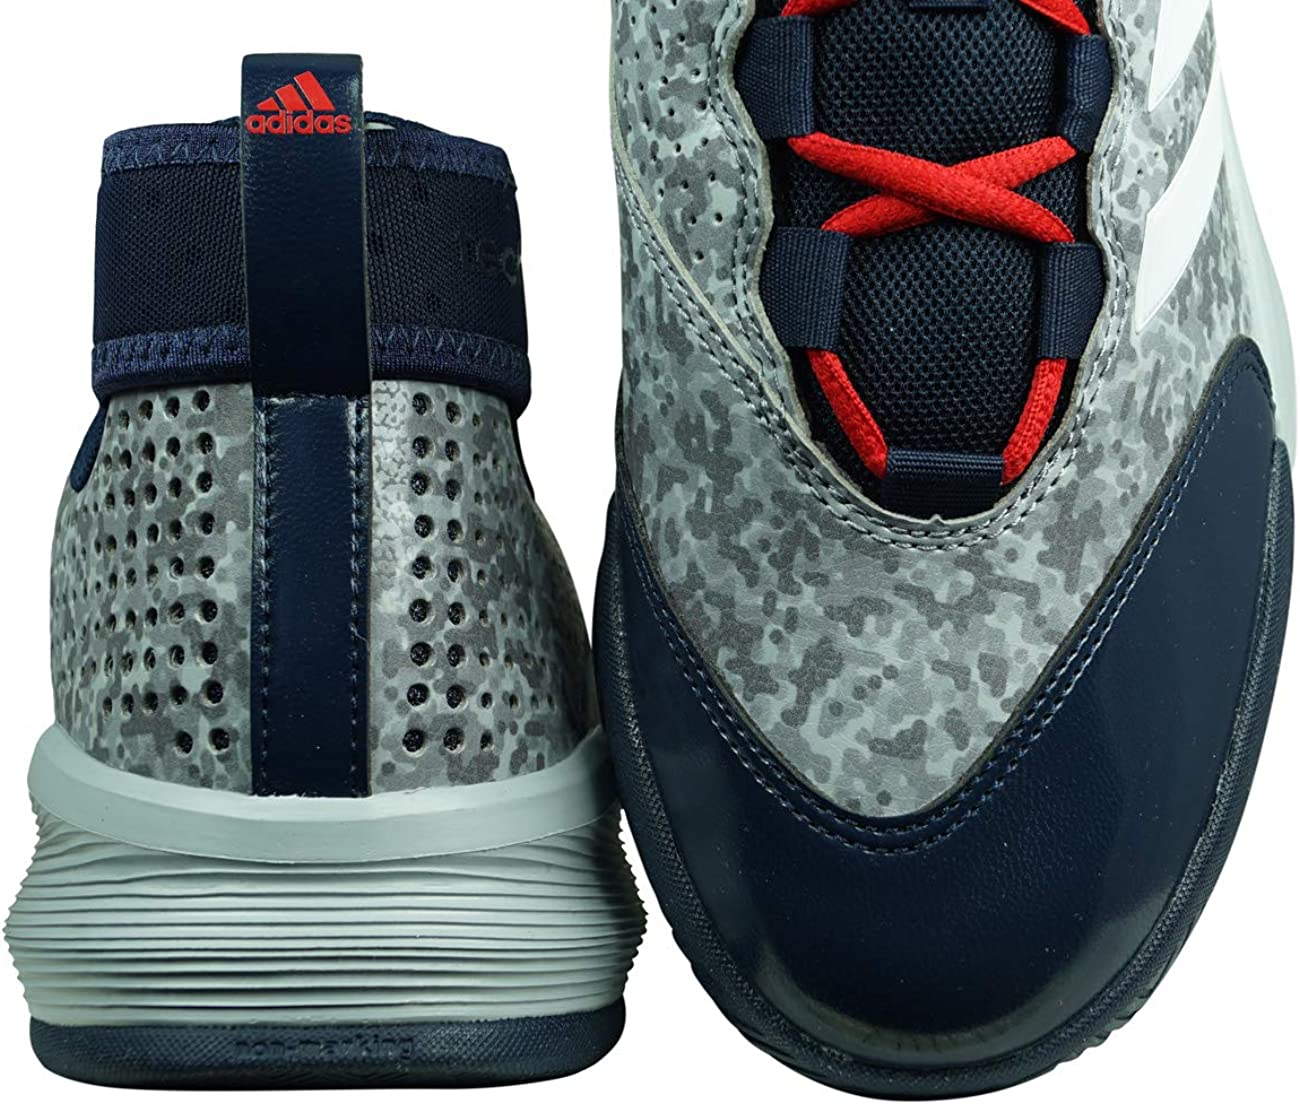 adidas Rim Reaper 2015 Baskets de Basketball pour Hommes